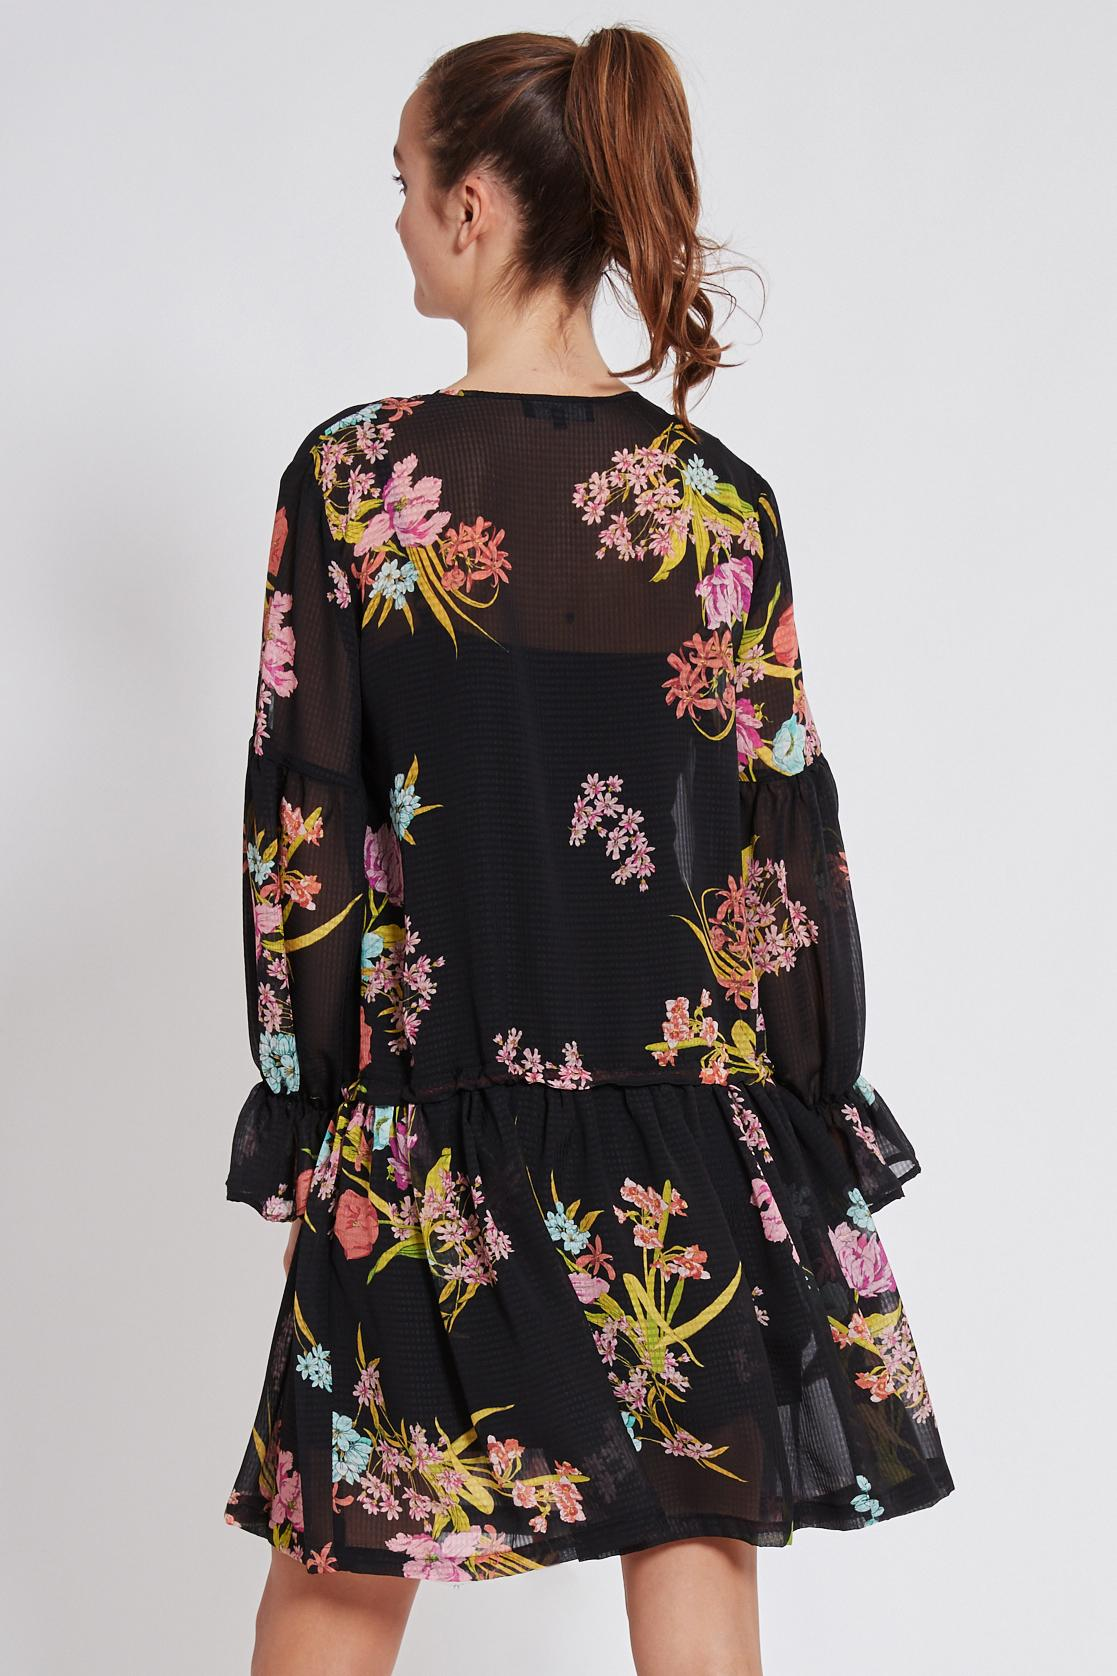 Rückansicht von Ana Alcazar Romantik Kleid Tamyde  angezogen an Model